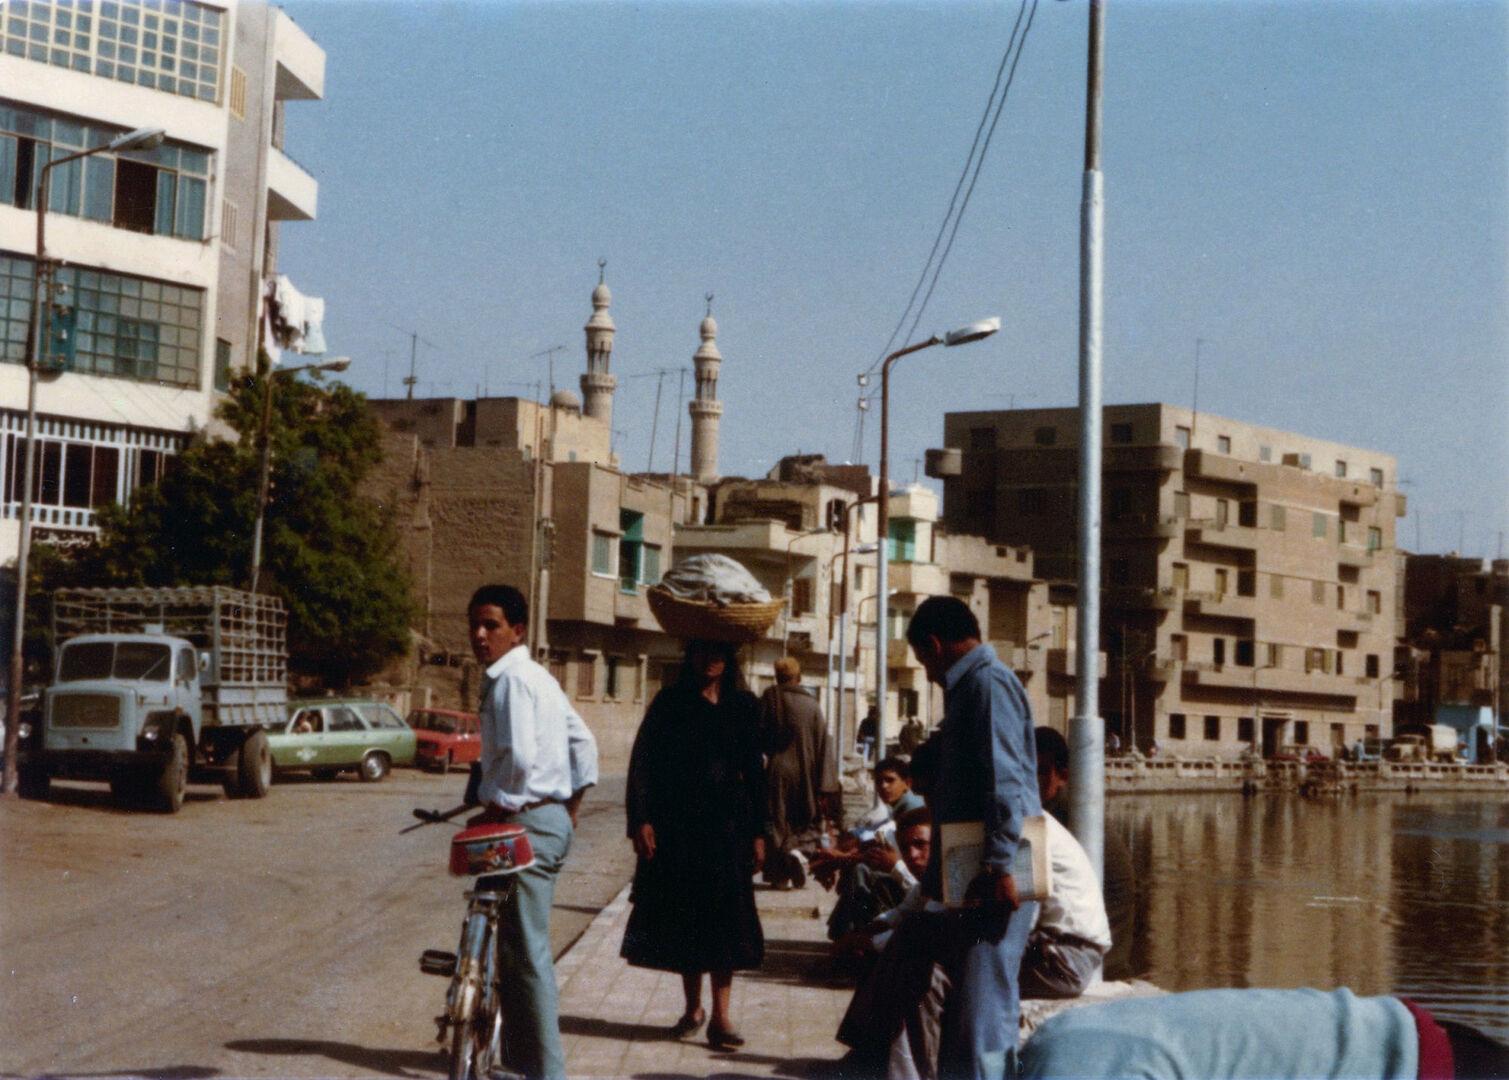 Benno Butter - Ägypten 1984 - Bild privat.jpg